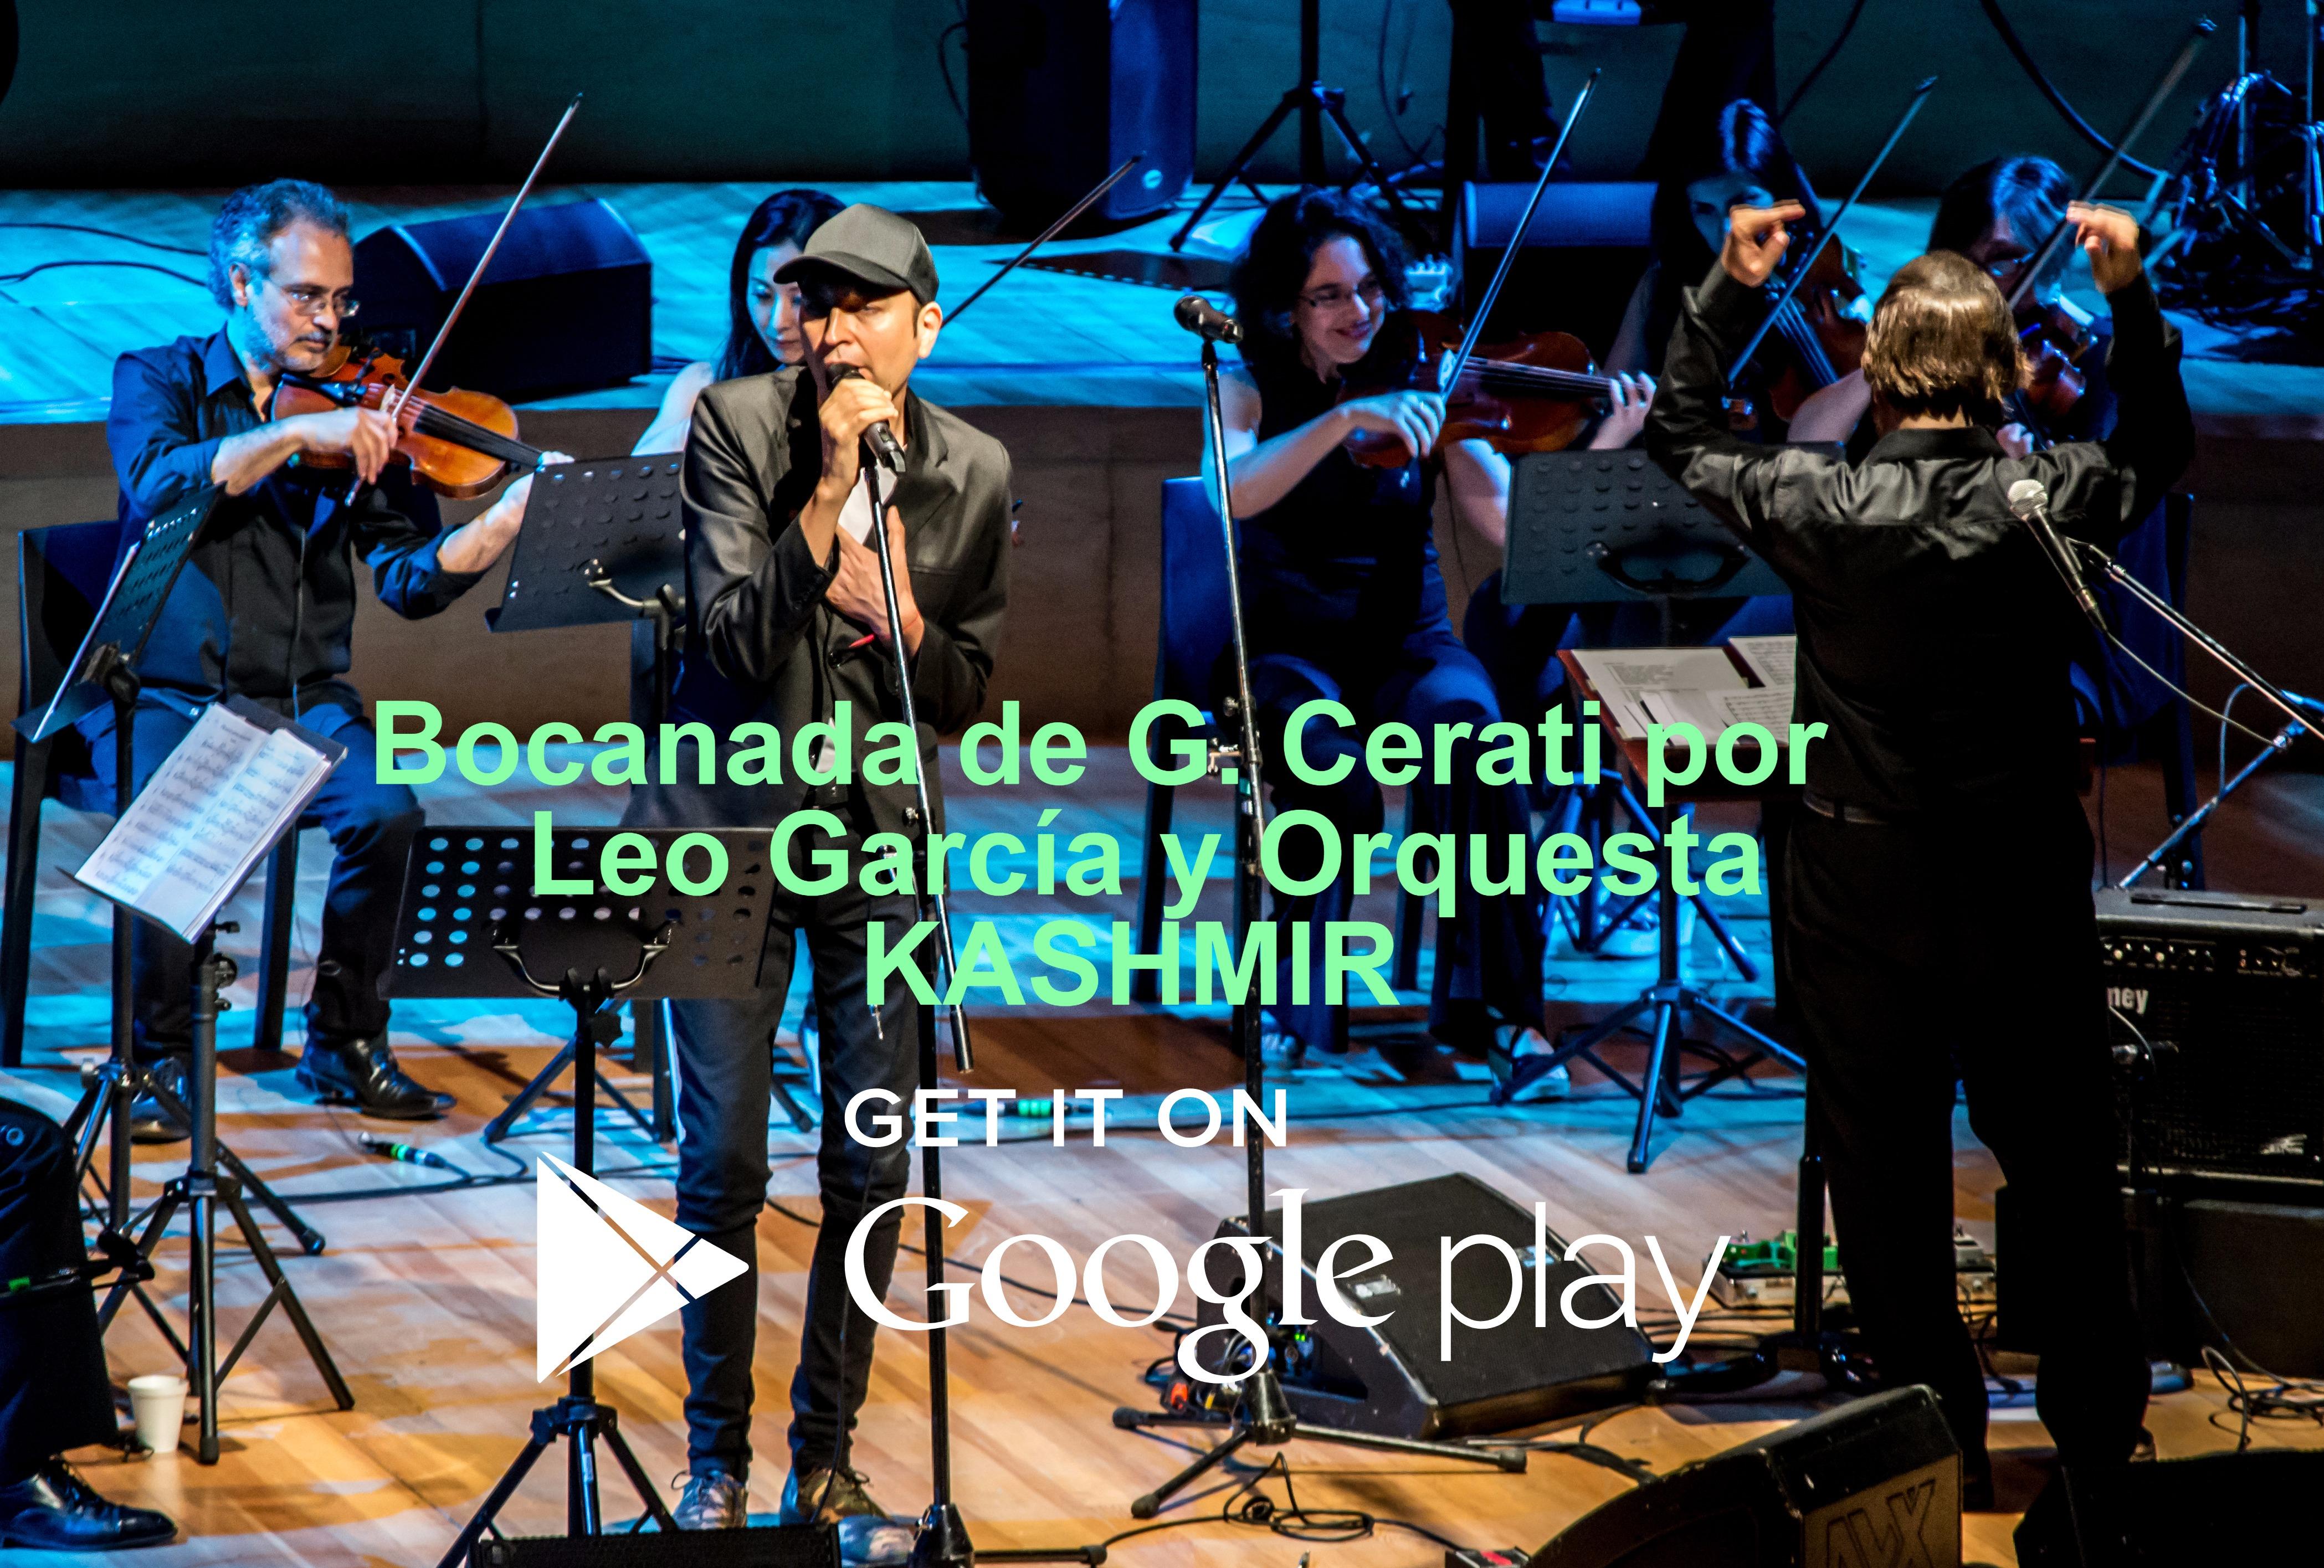 KASHMIR_LEO_GOOGLE_PLAY